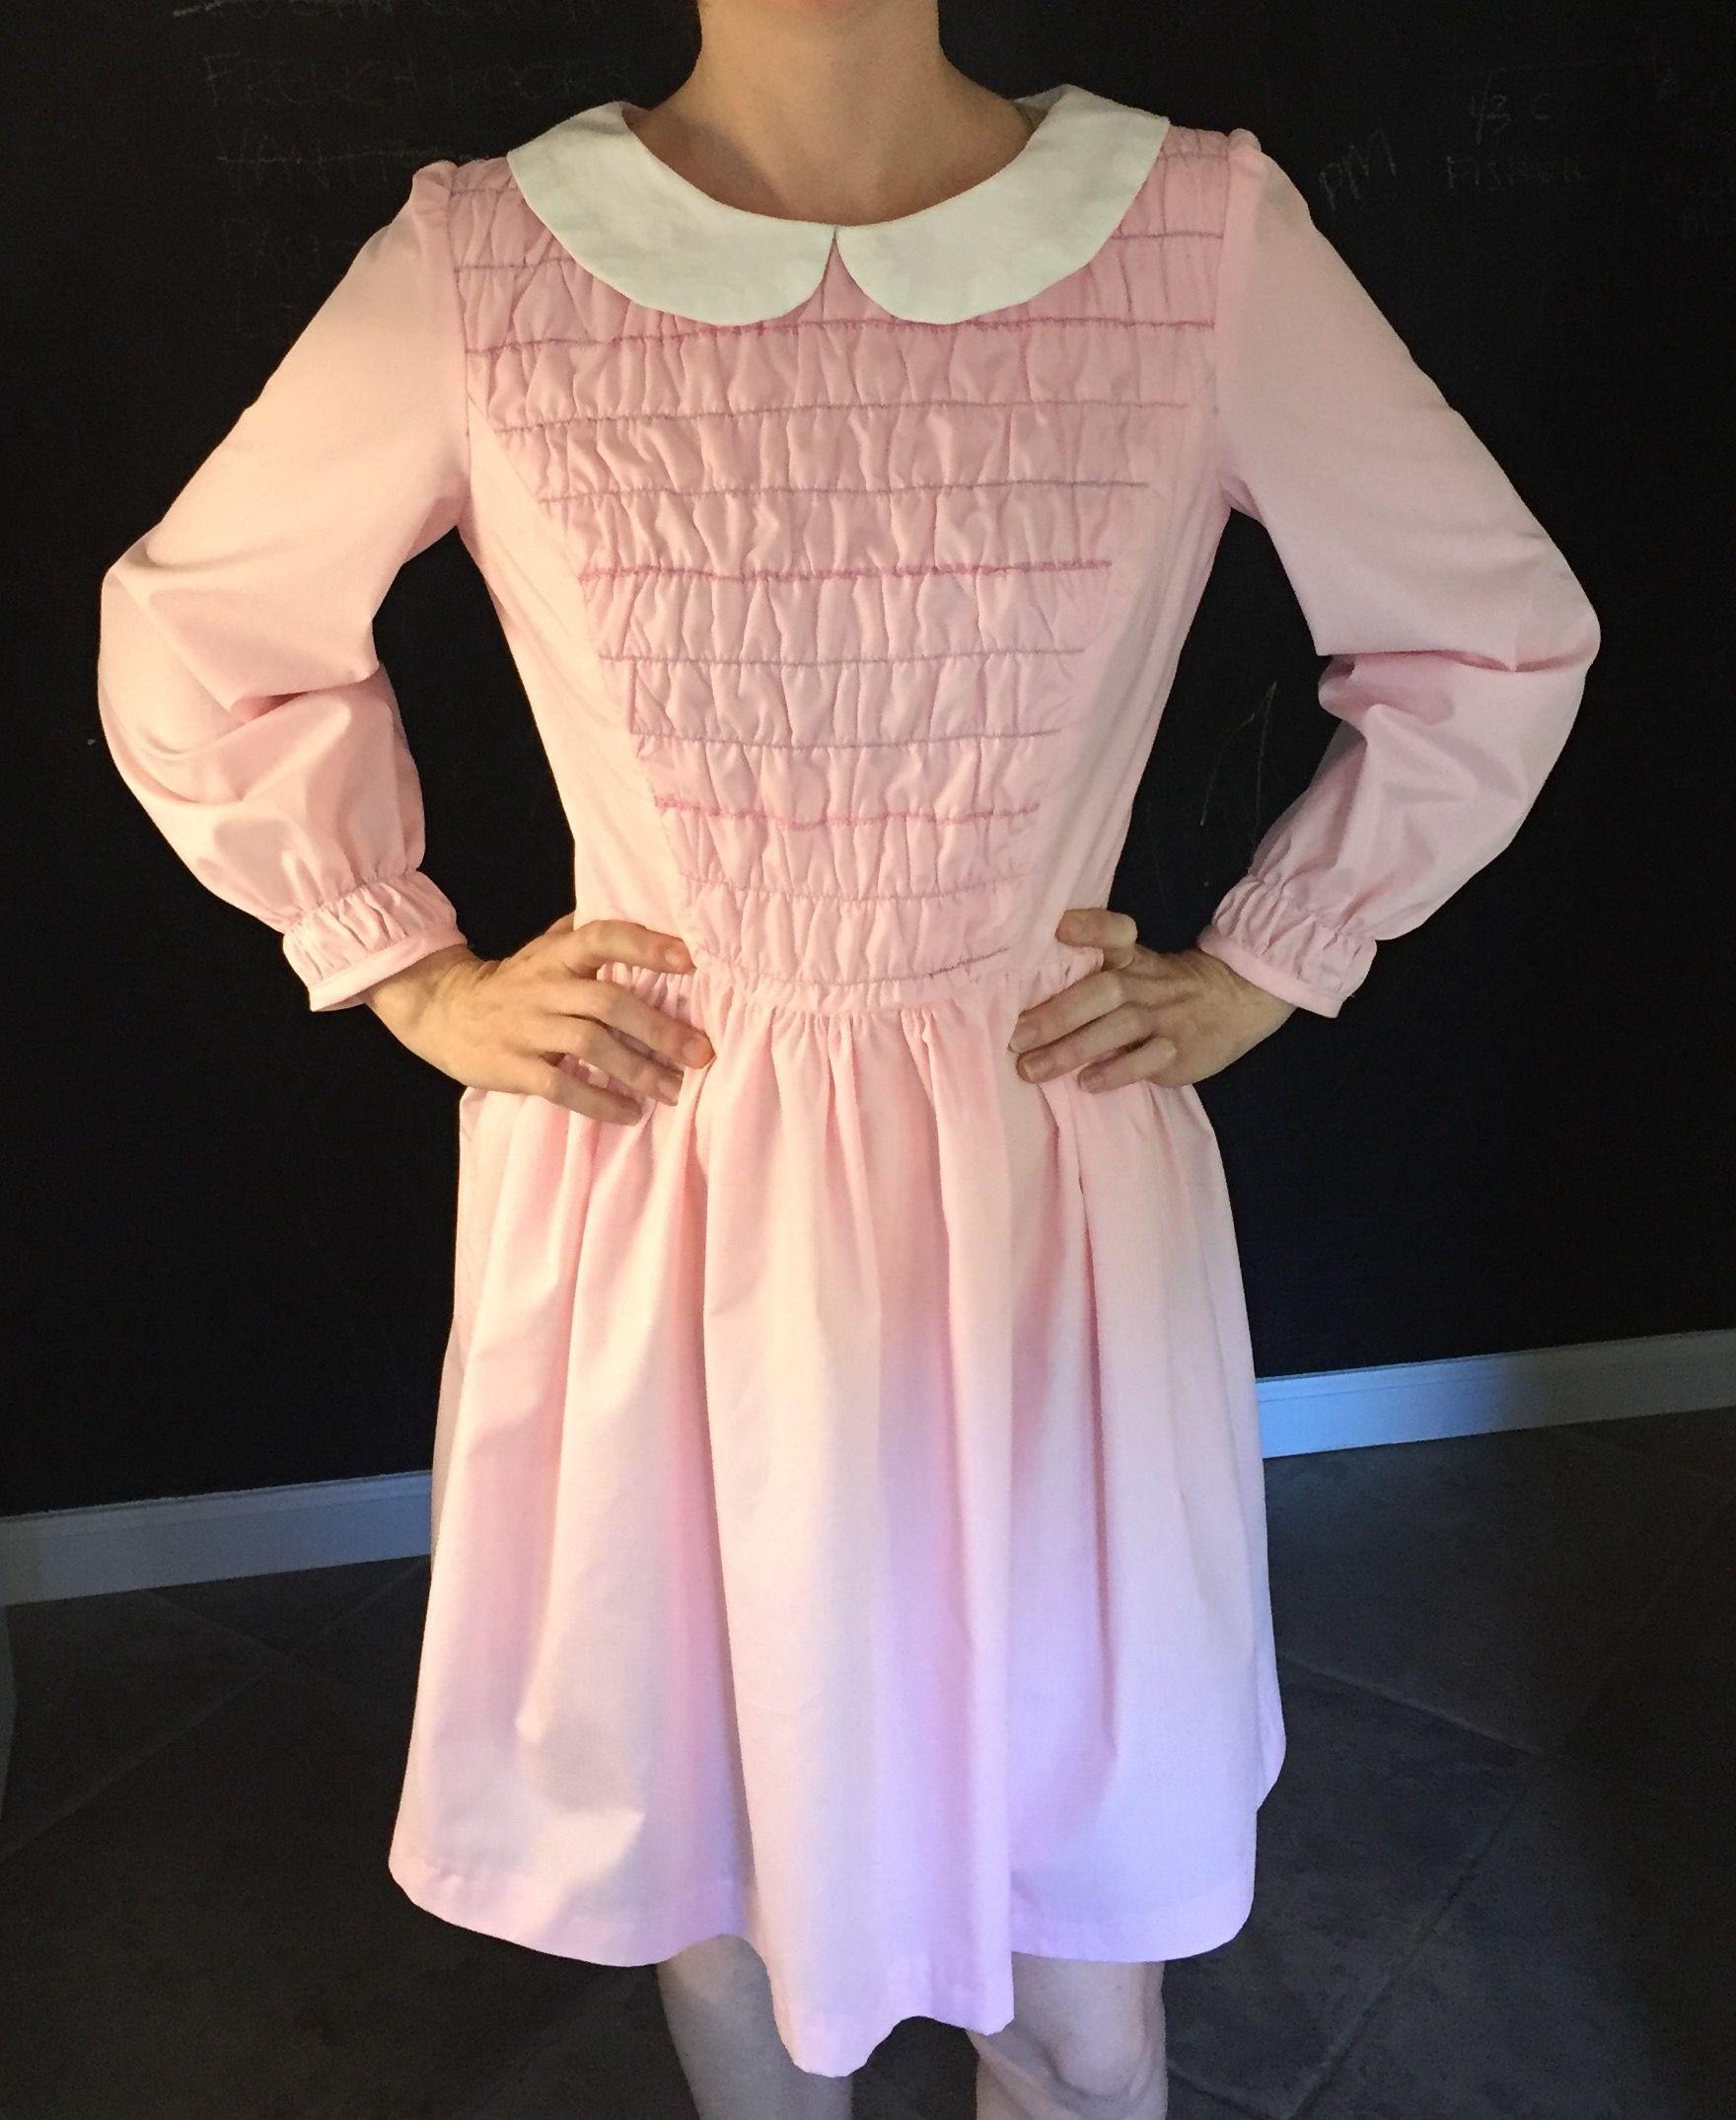 cfbe07c15d3c Stranger Things Dress - Eleven, 11, Cosplay or Halloween costume ,  handmade, pattern, Polly Flinders, Etsy, sewing pattern